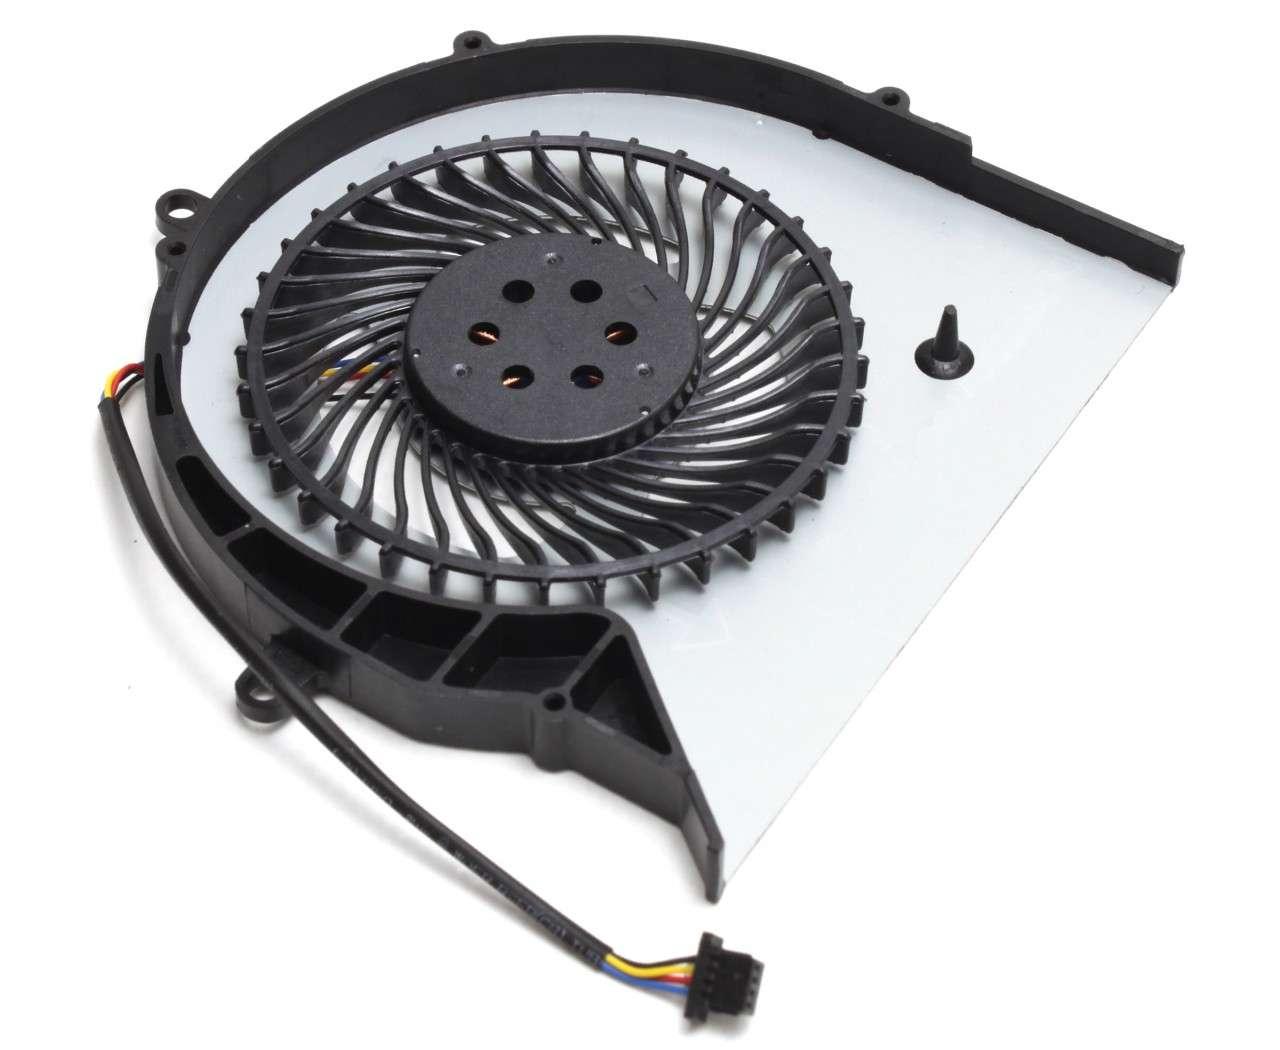 Cooler procesor CPU laptop Asus GL503V imagine powerlaptop.ro 2021